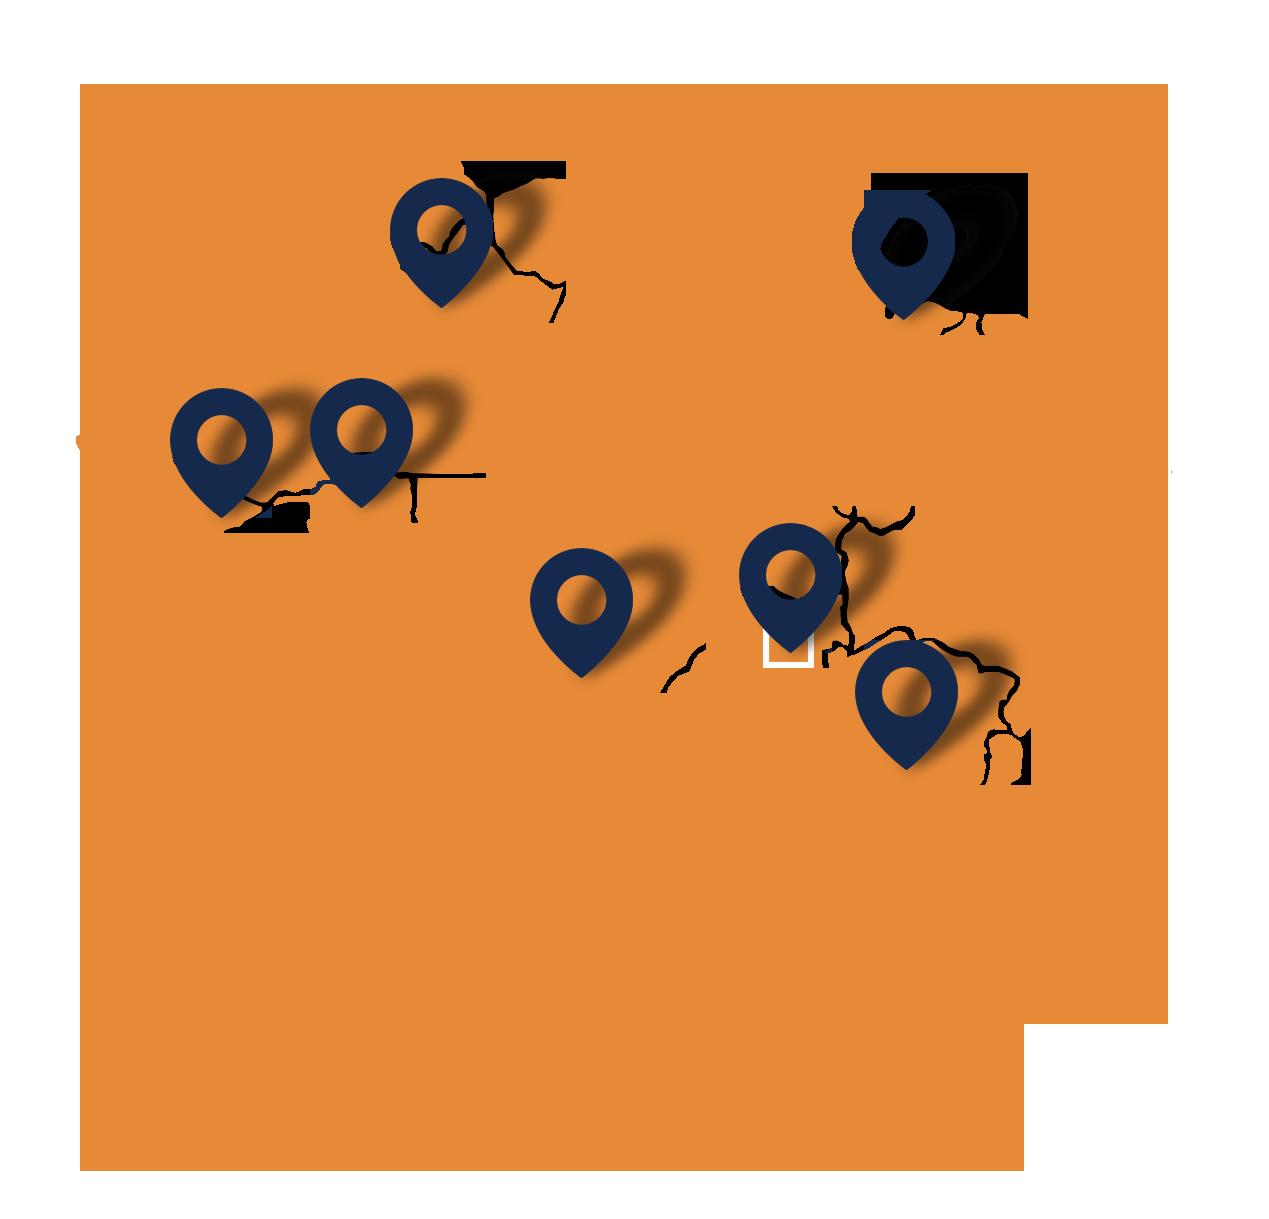 https://barretodolabella.com.br/wp-content/uploads/2021/04/barreto-unidades.png